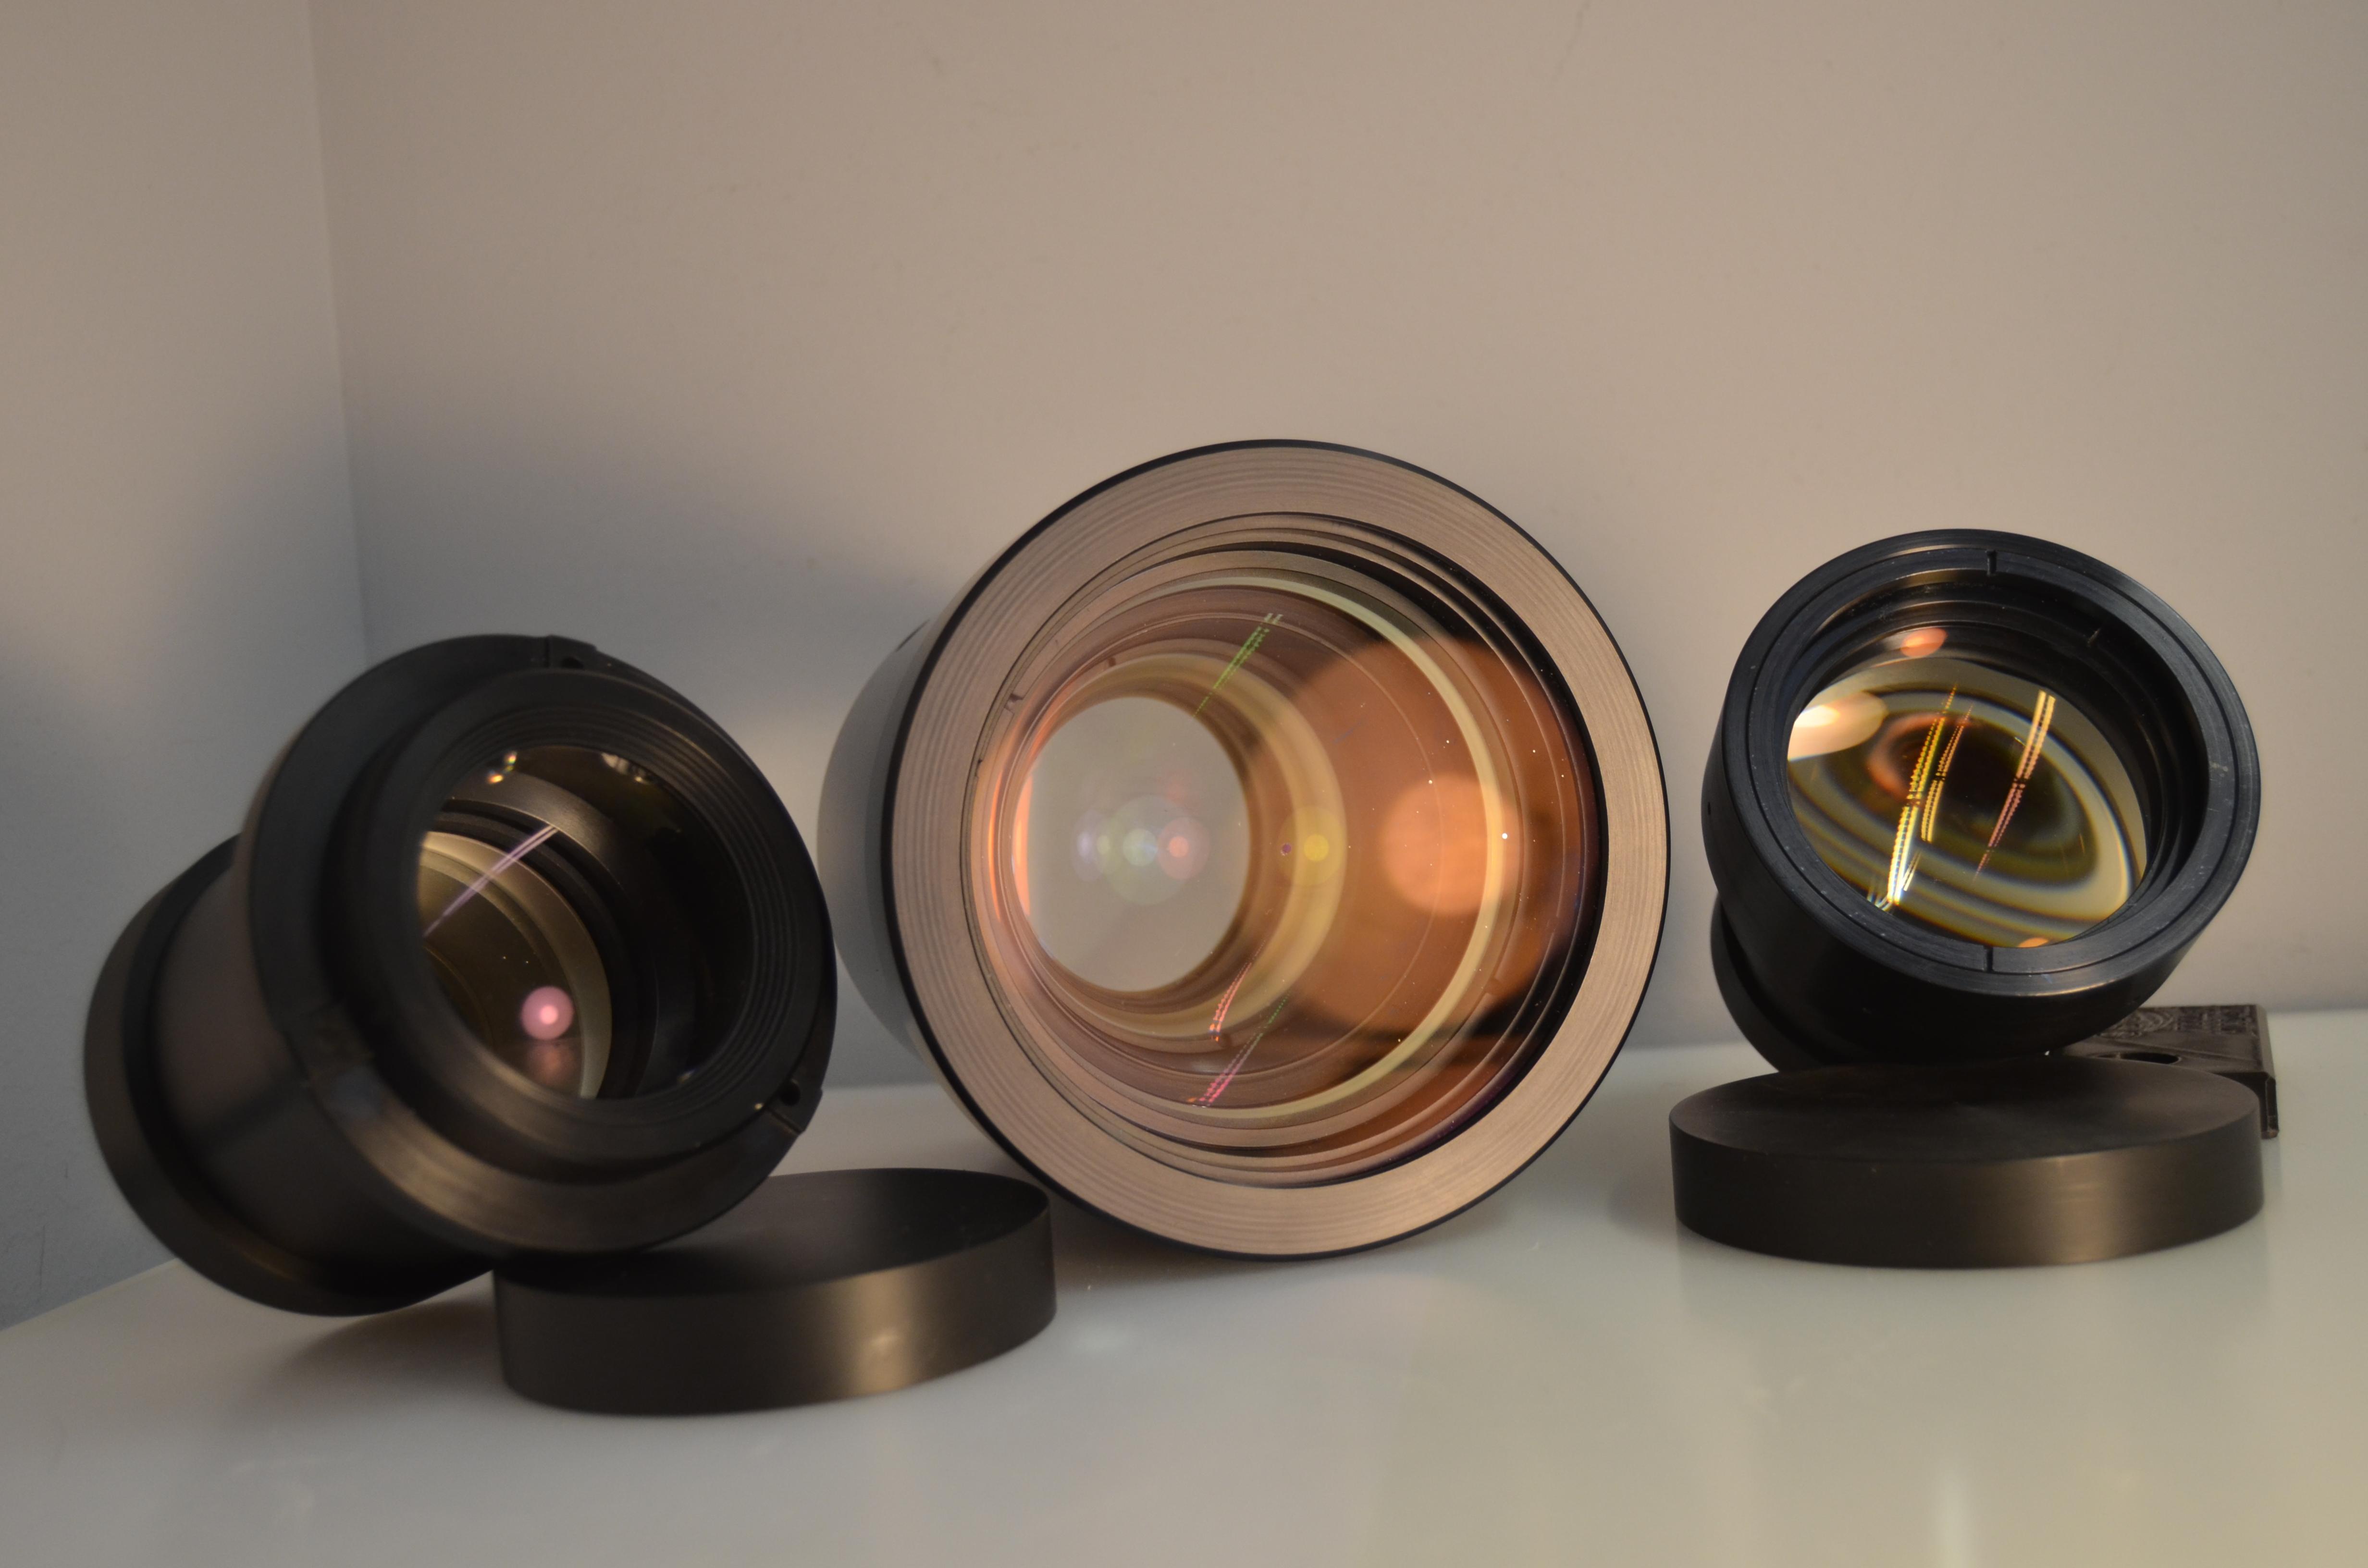 Synchrotron objective lenses